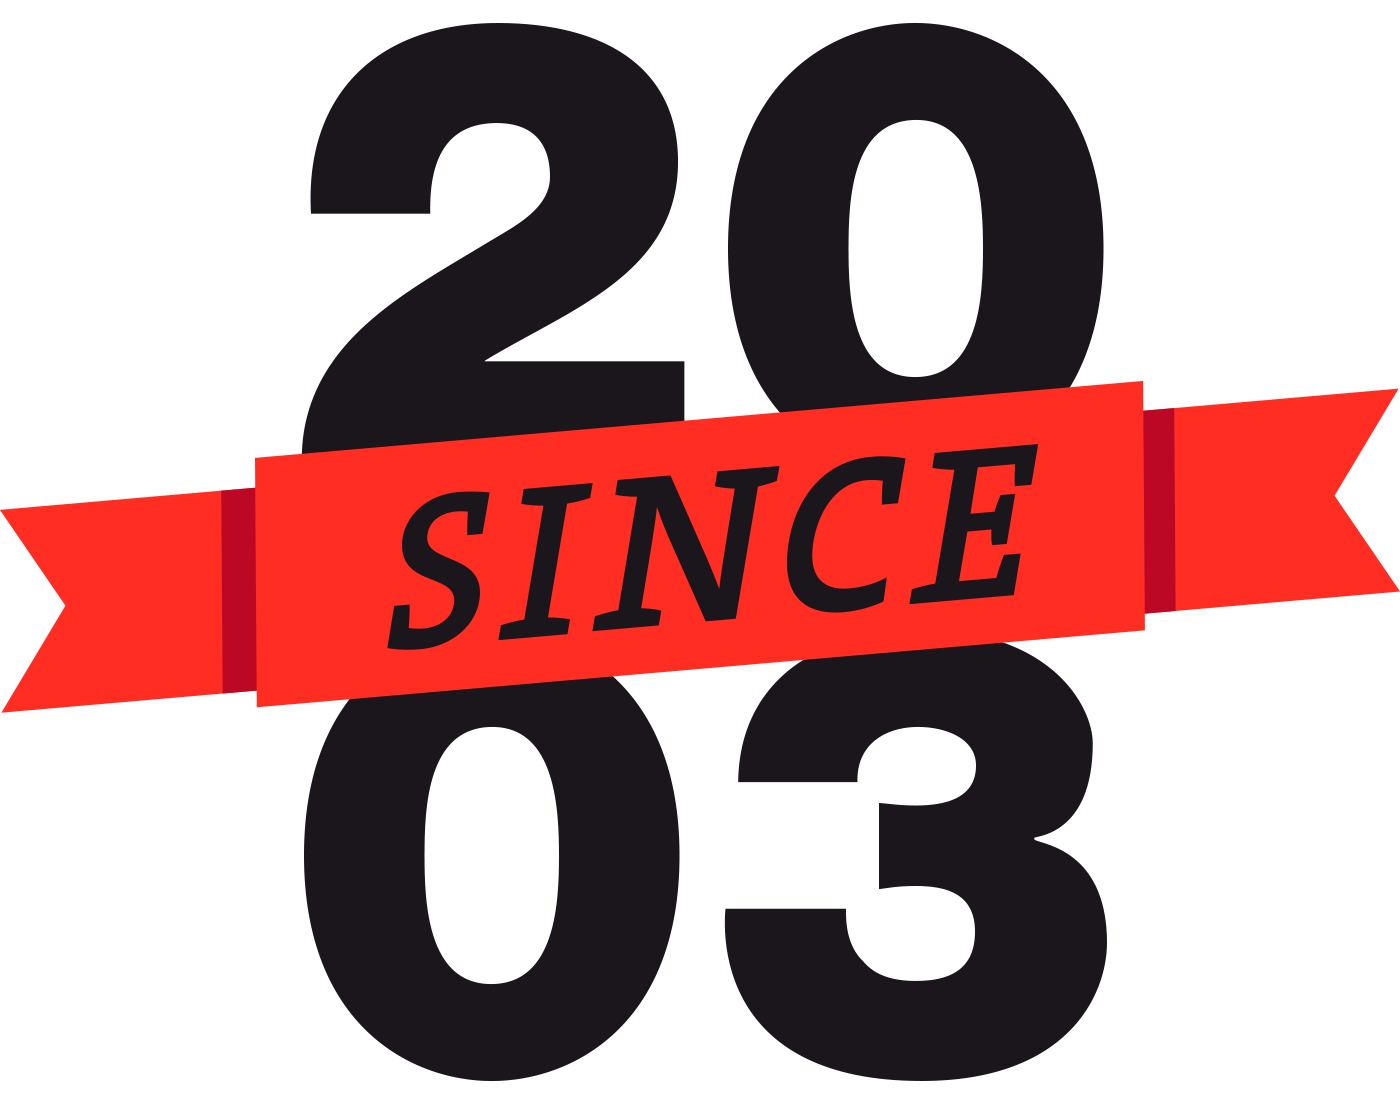 since2003